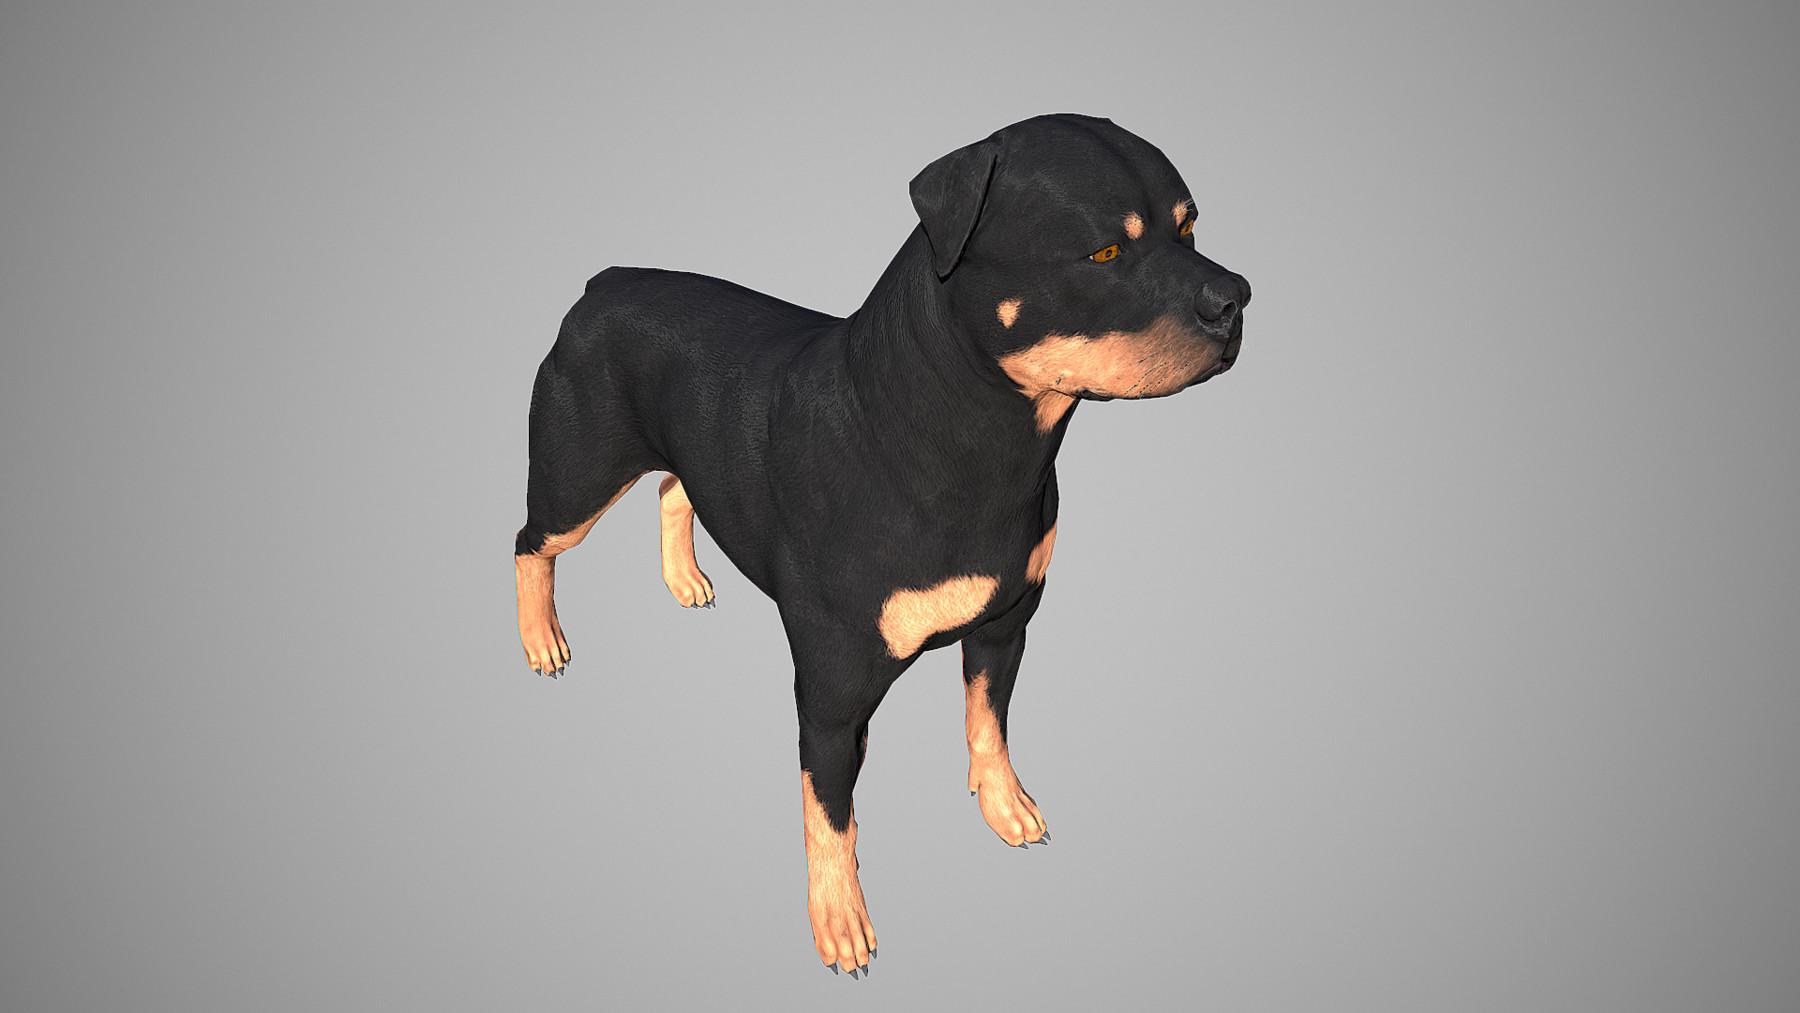 Rottweiler by alexlashko marmoset 07